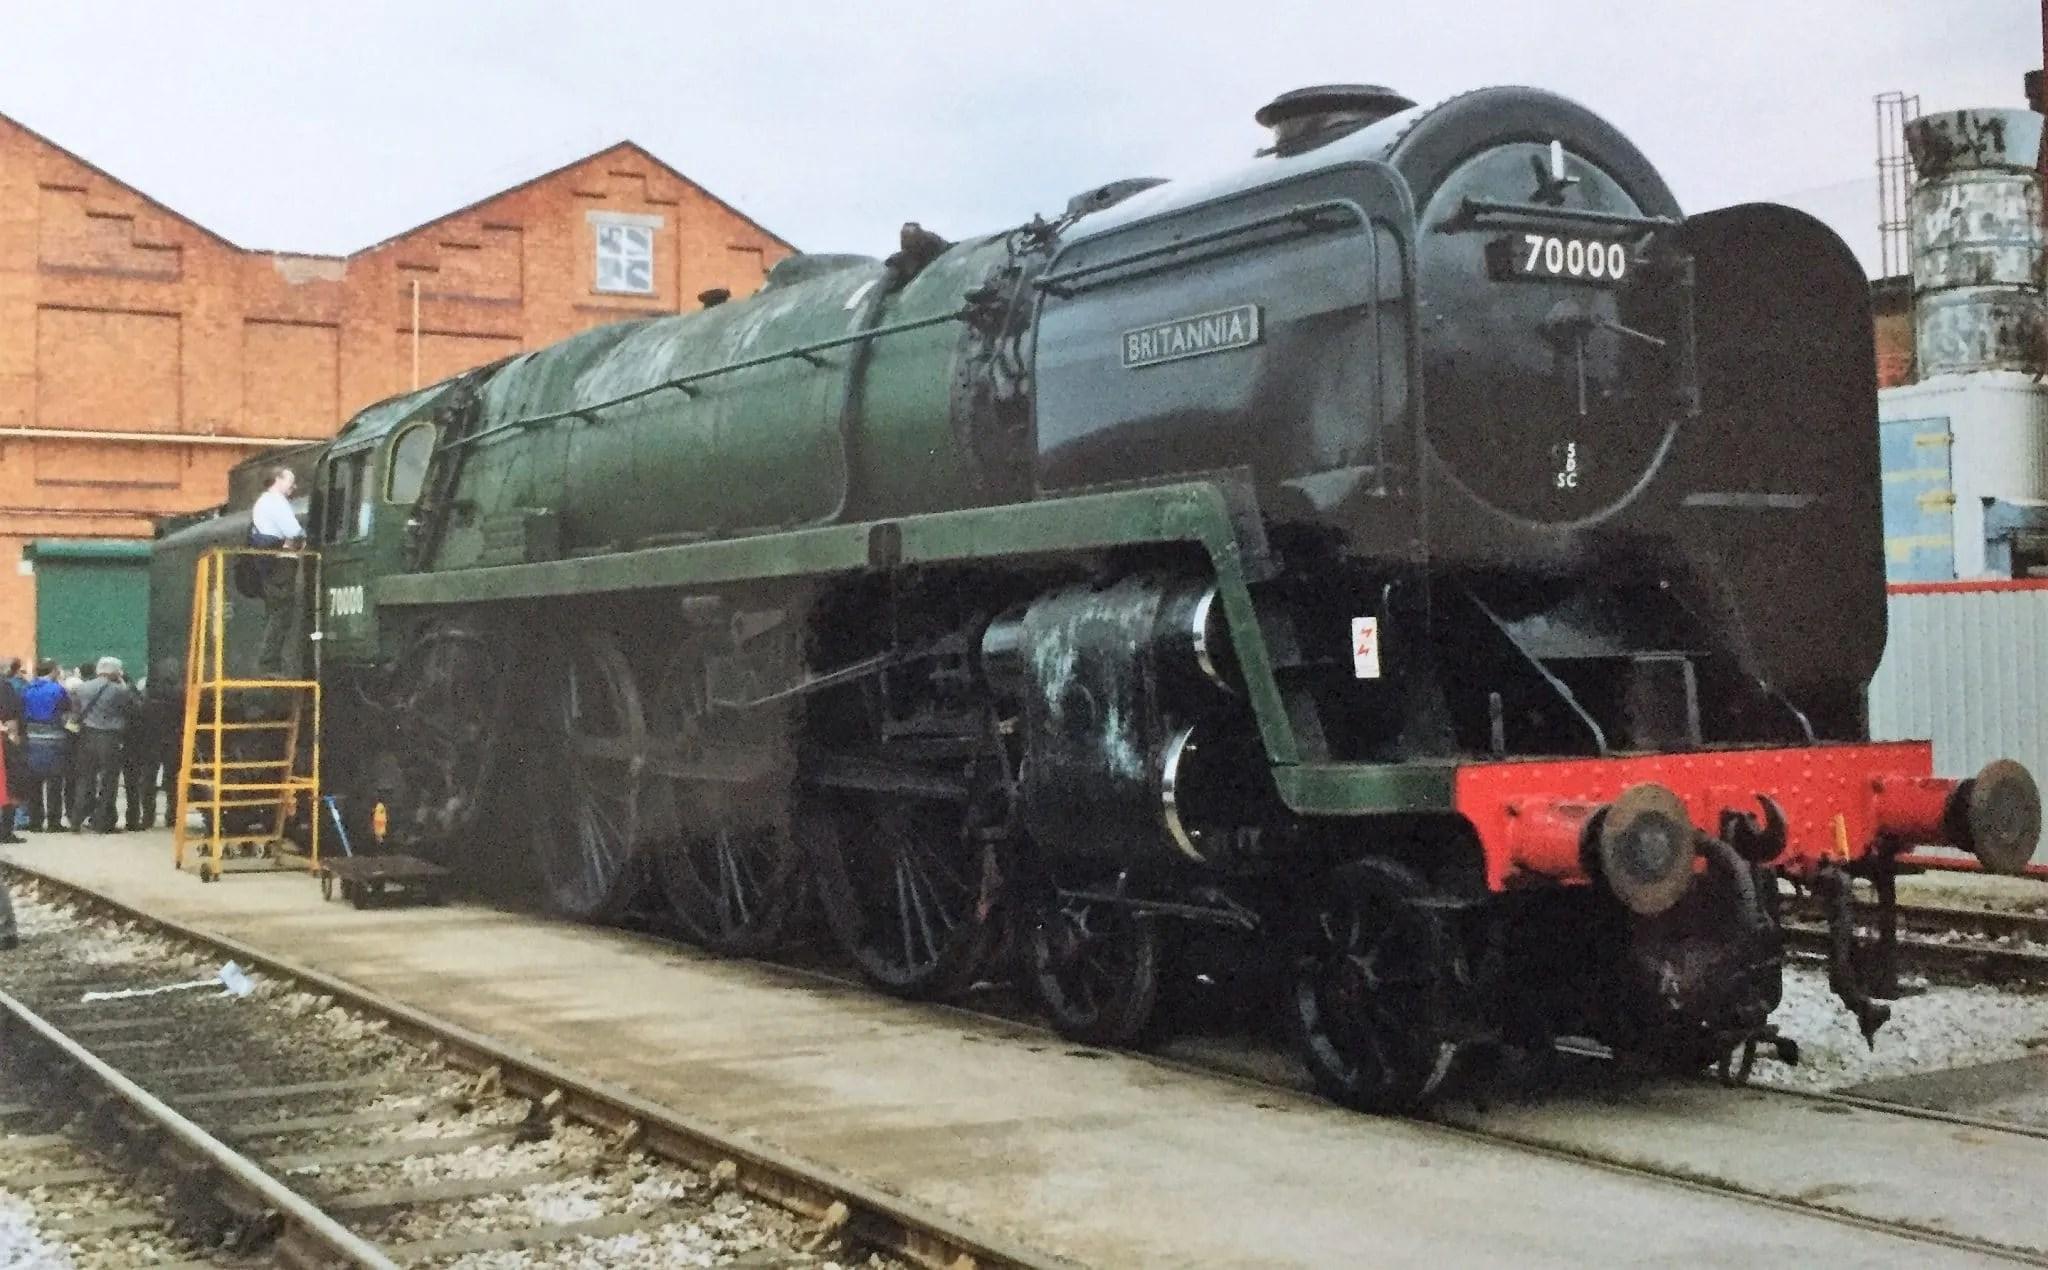 Crewe works memories - 70000 - Brittania - BR Standard Class 7